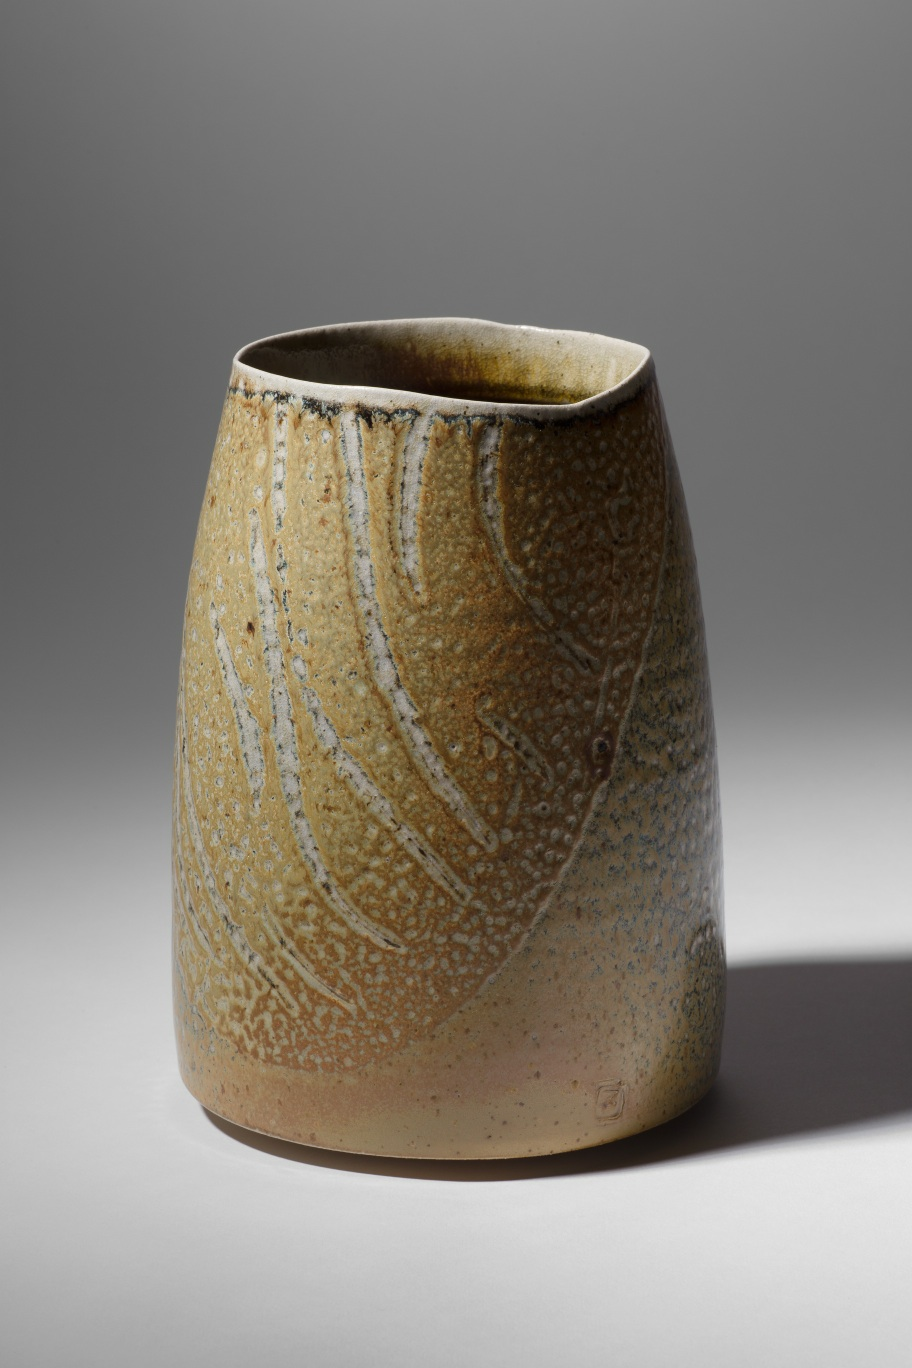 Mandy Parslow, MP07 Barrel Vessel, wood fired salt glazed stoneware, 20 x 14cm, EUR 380